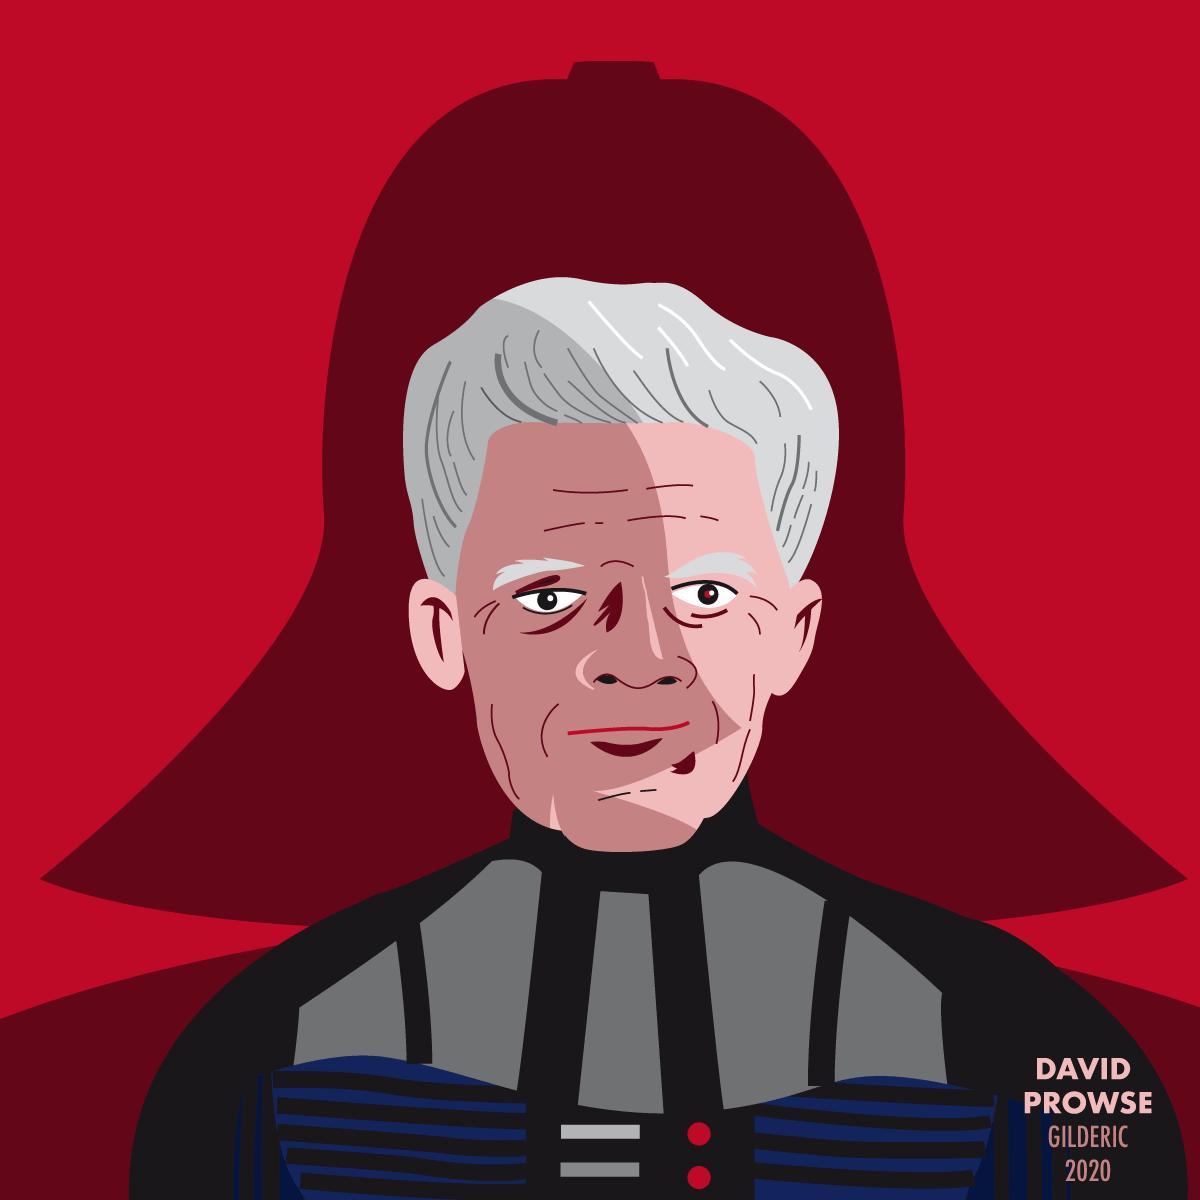 Portrait de David Prowse, dans l'ombre de Dark Vador (flat design vector illustration)